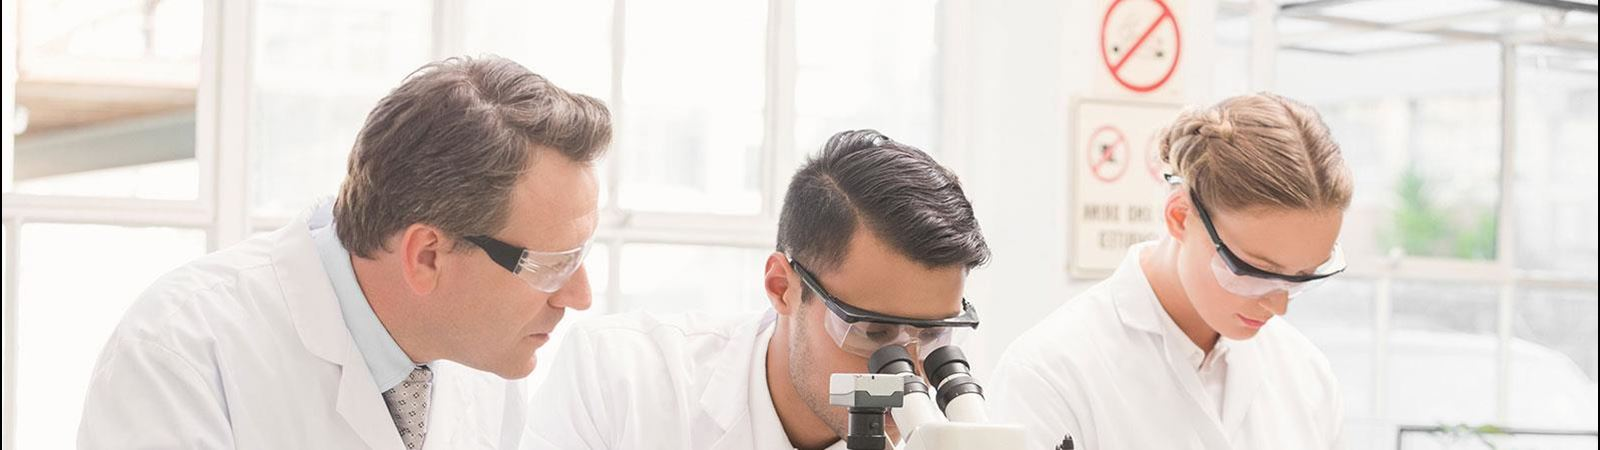 three researchers in a lab